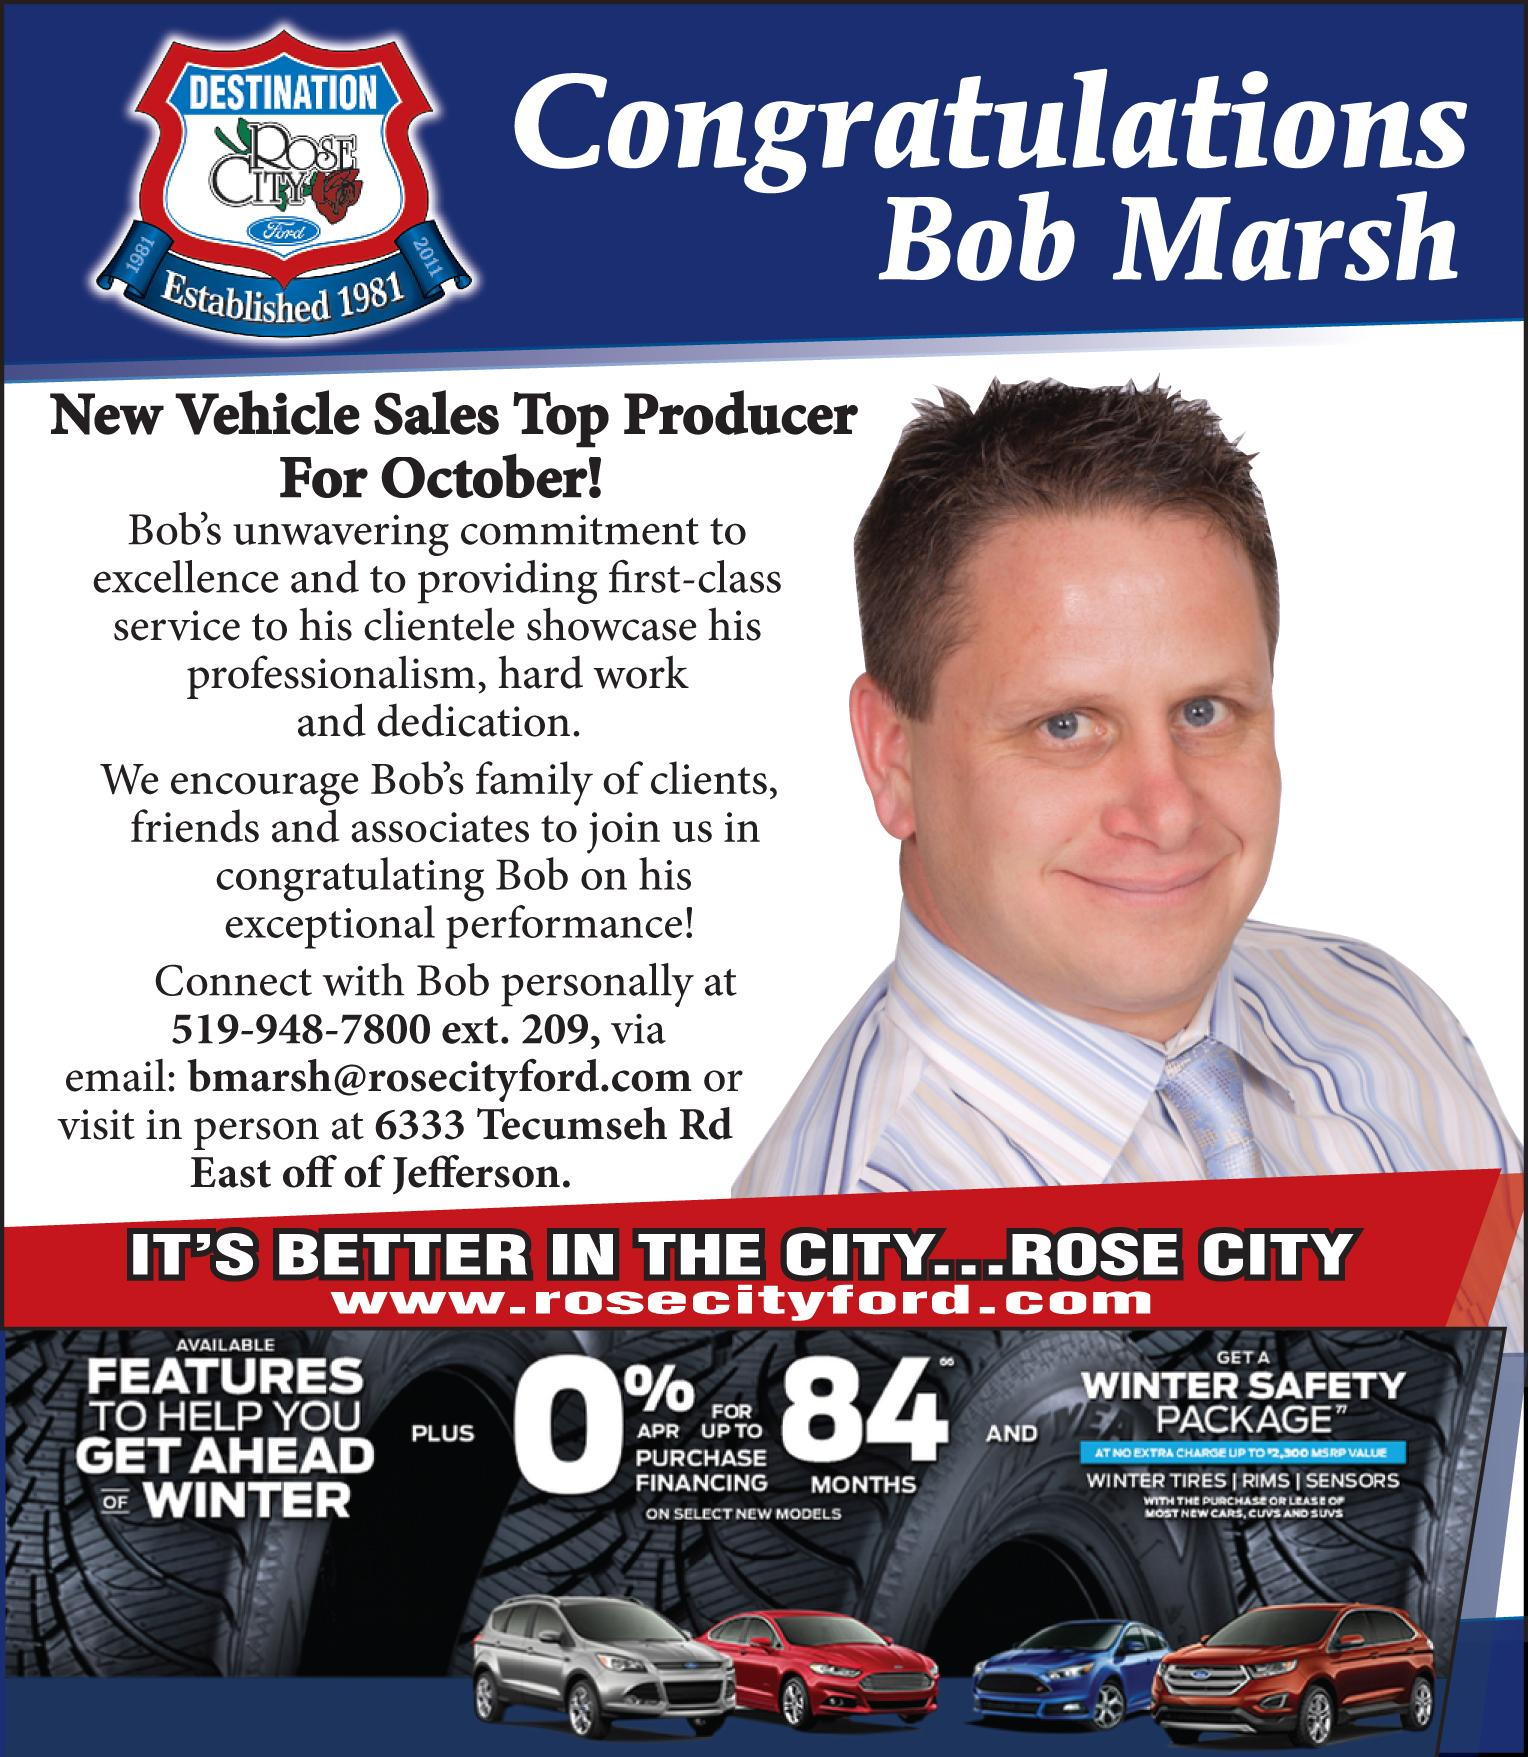 Ford Congratulations Bob Marsh image